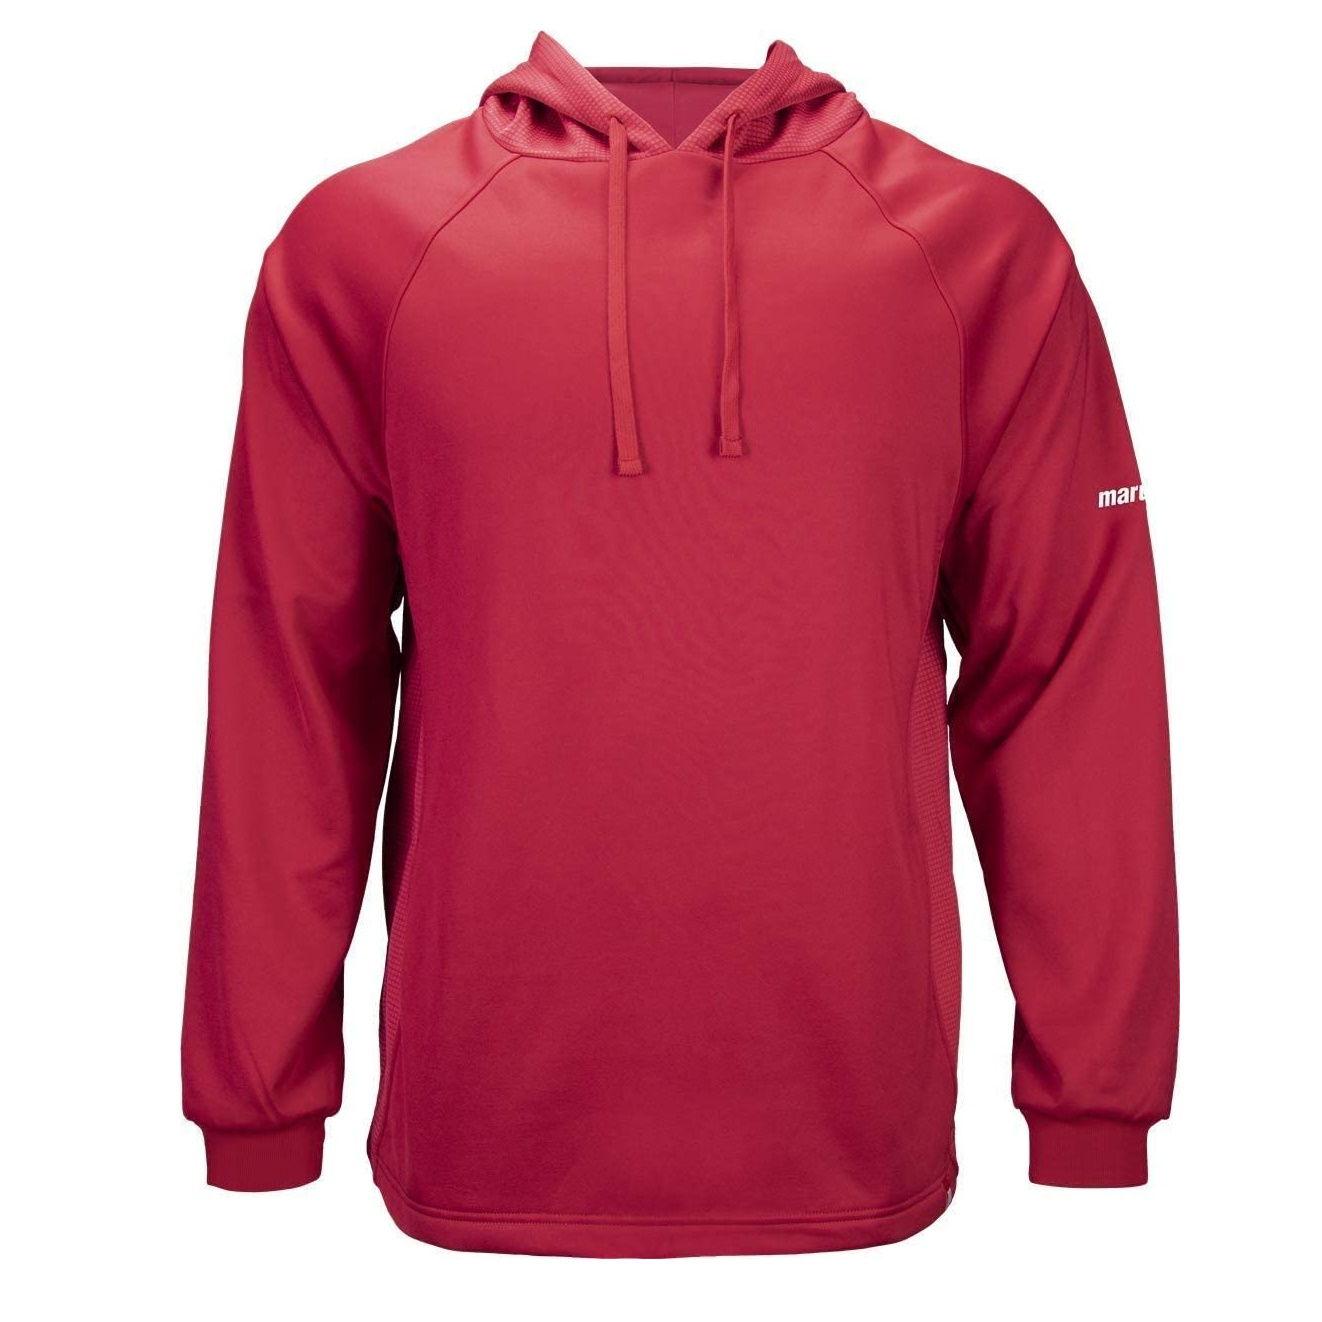 marucci-sports-boys-warm-up-tech-fleece-matflhtc-red-youth-xl-baseball-hoodie MATFLHTC-R-YXL   Marucci Sports - Warm-Up Tech Fleece MATFLHTCY Baseball Hoodie. As a